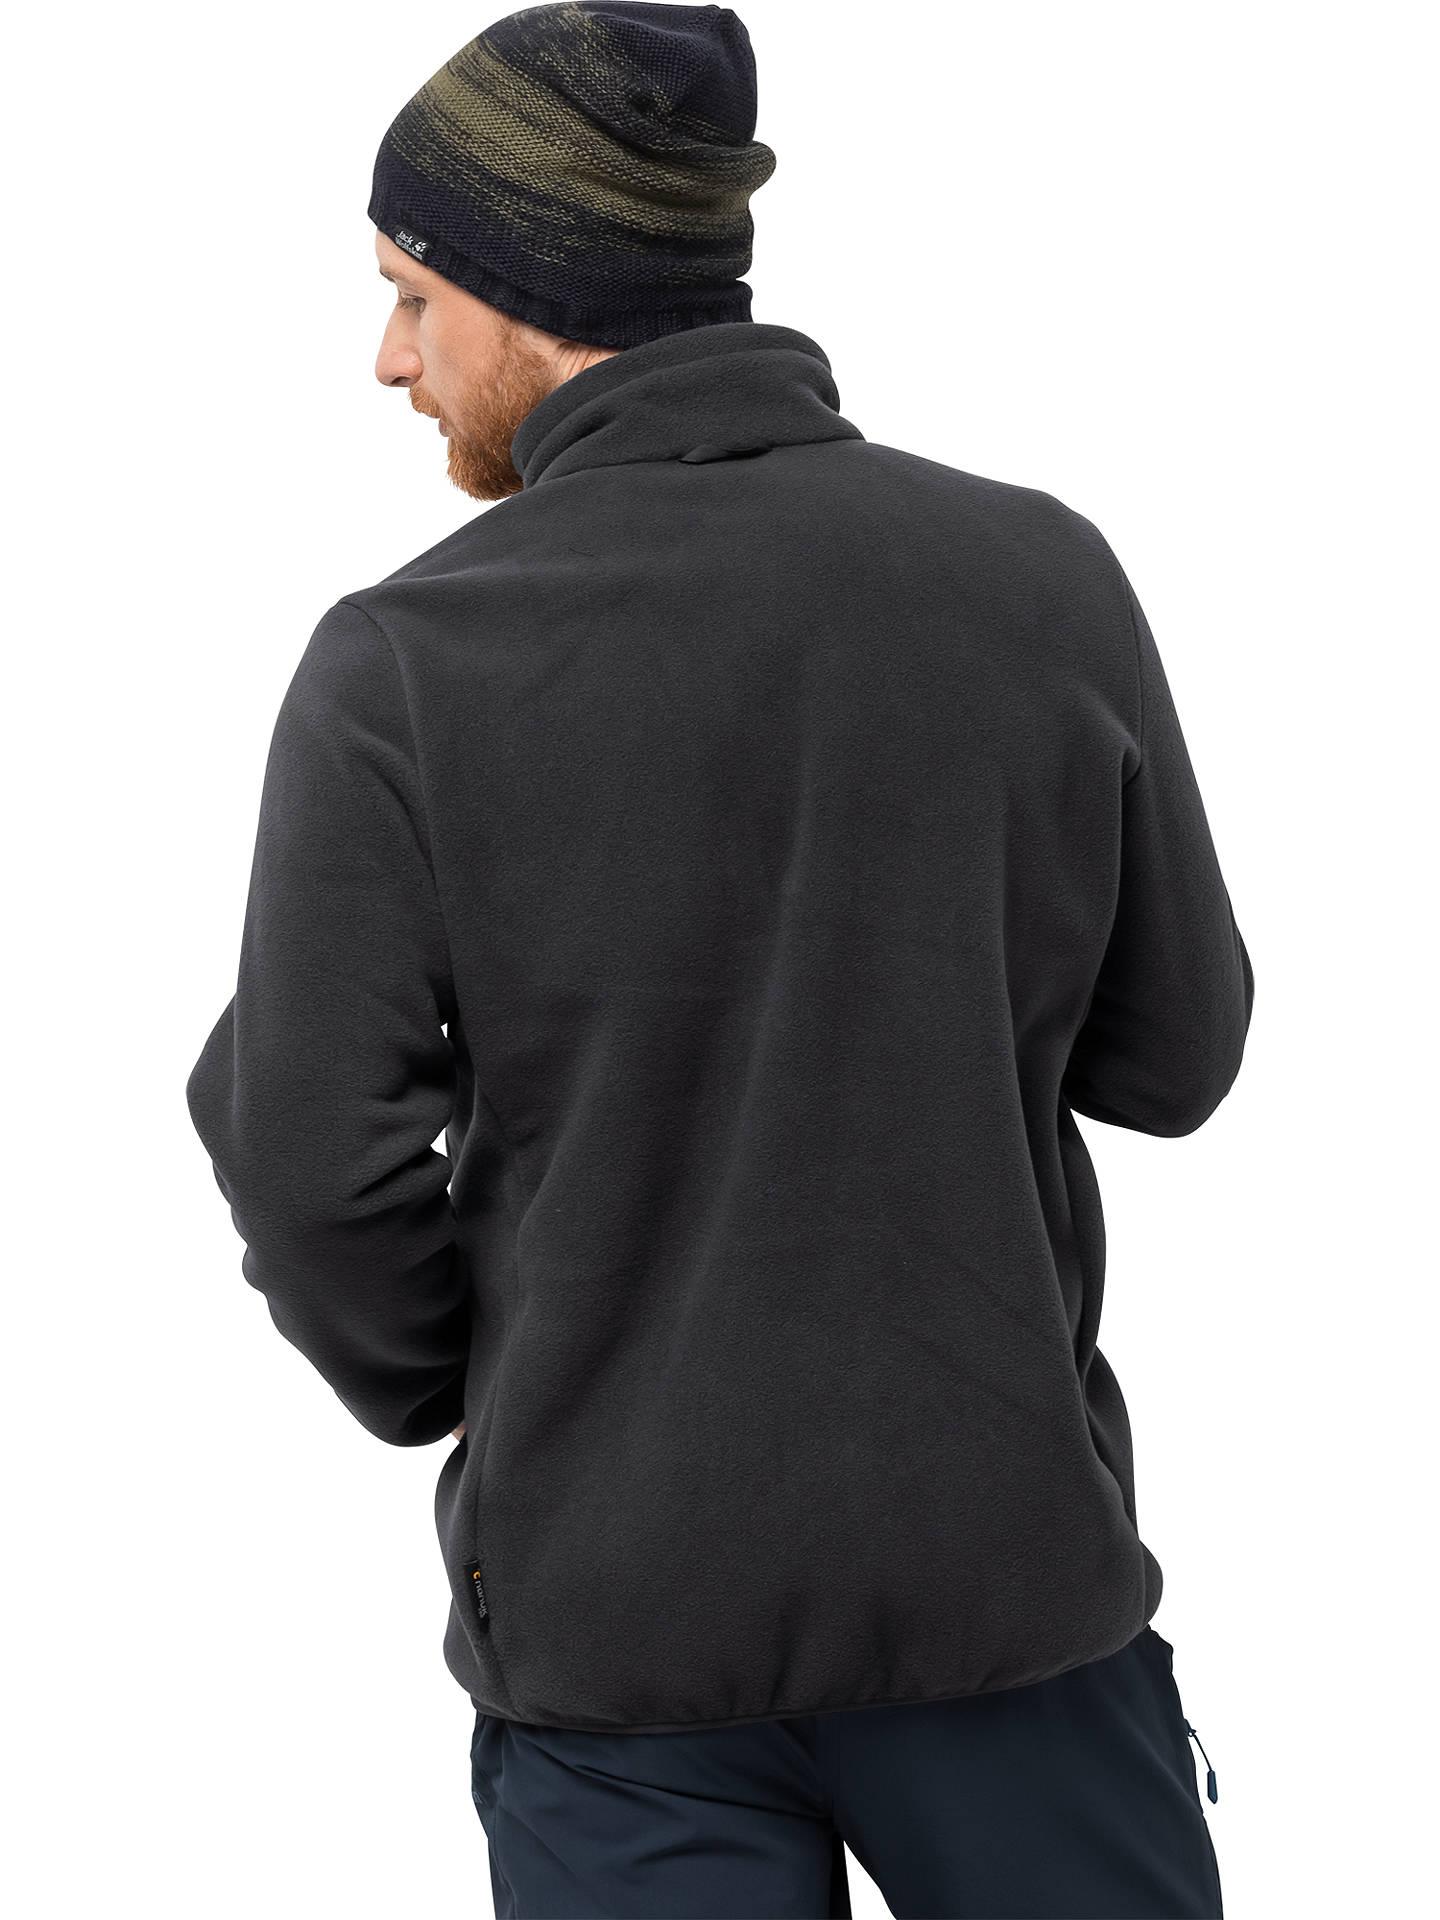 brand new bb2ef 98815 Jack Wolfskin Gotland 3-in-1 Men's Jacket, Black